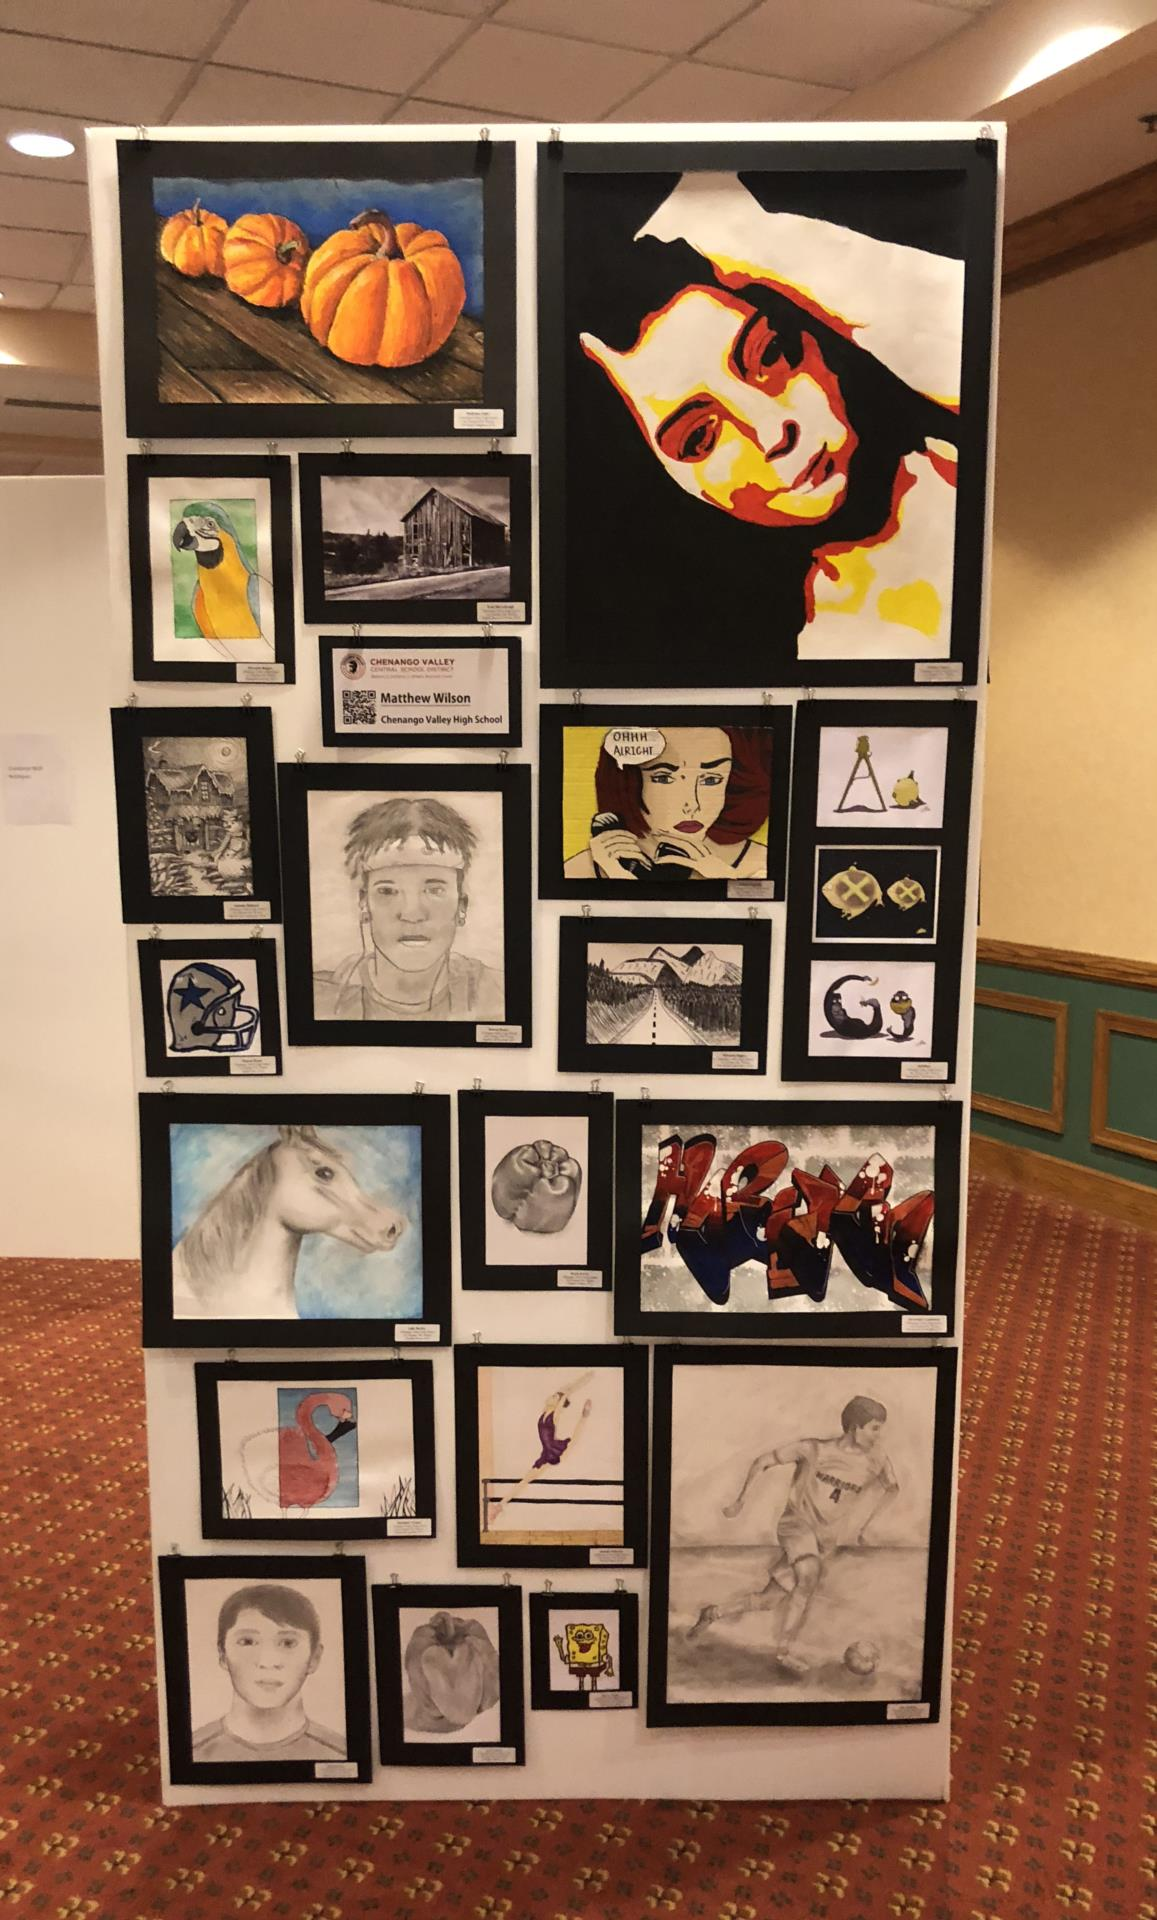 student art work on display